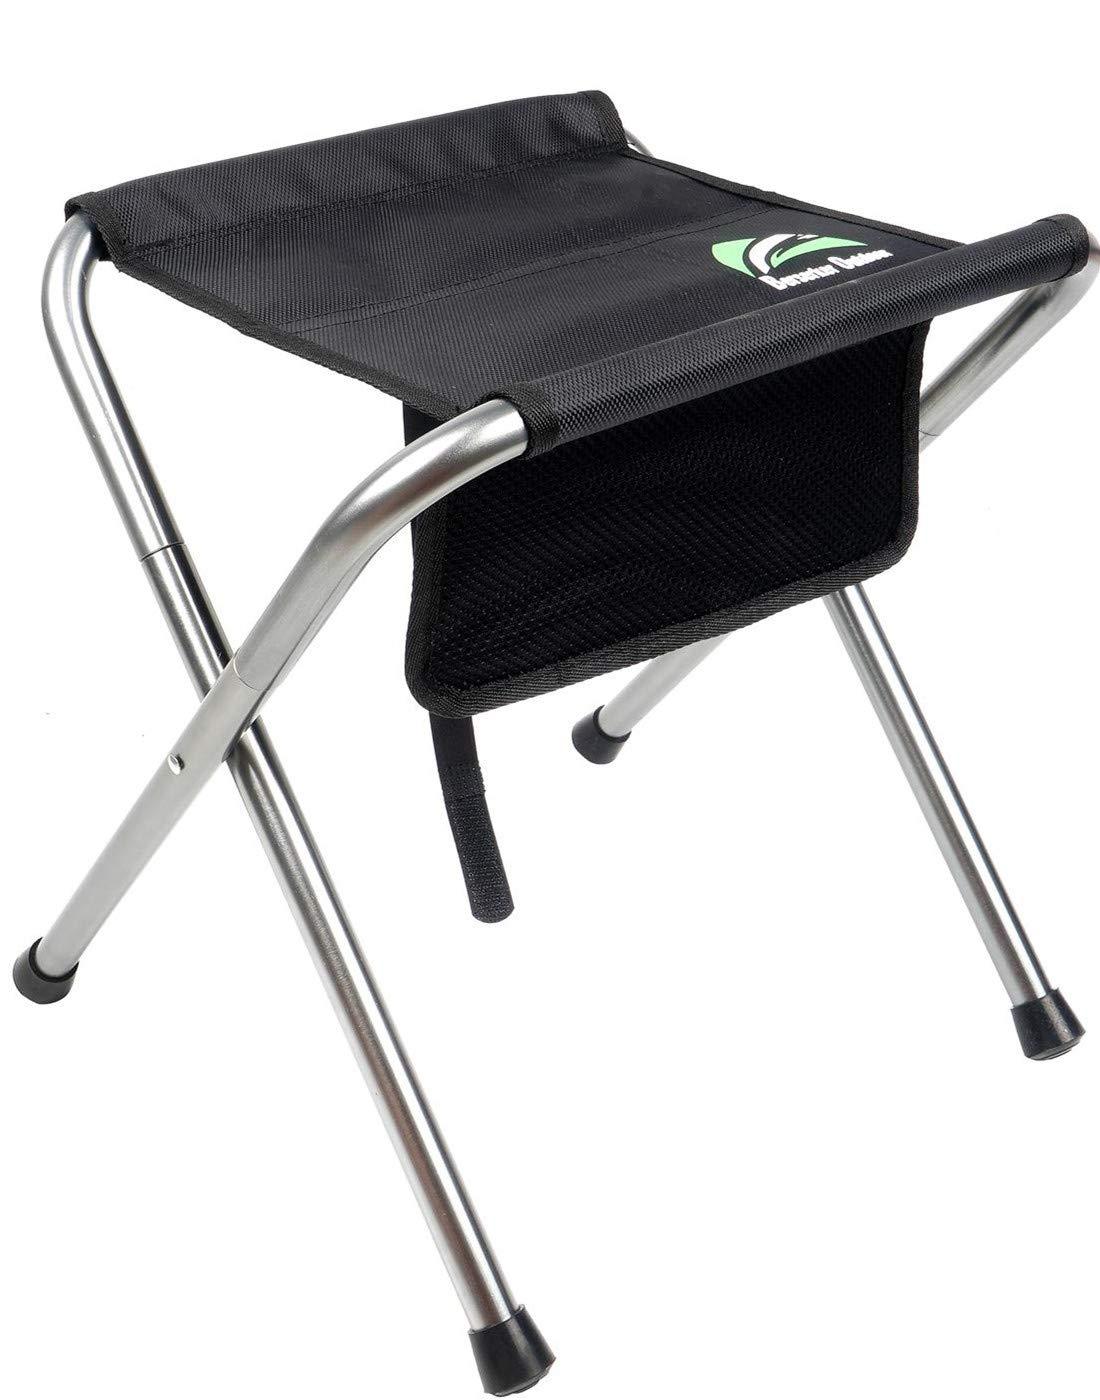 Folding Camping Multifunction Stool or Table Hiking Aluminium Lightweight